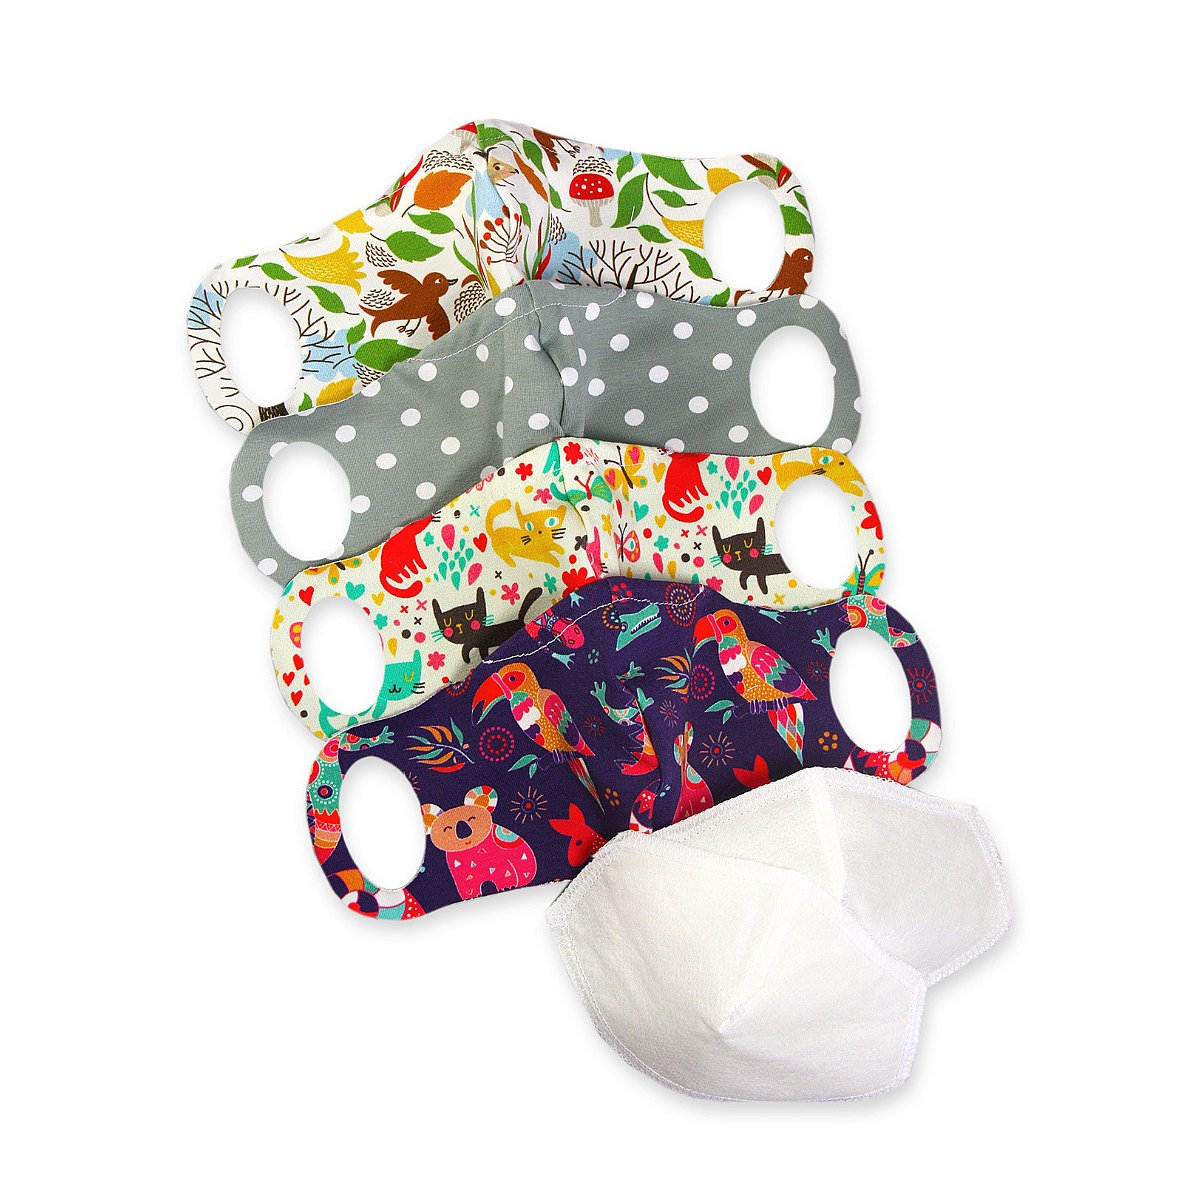 4x Petit Lulu rouška pro děti vel. XS + 2x nanofiltr